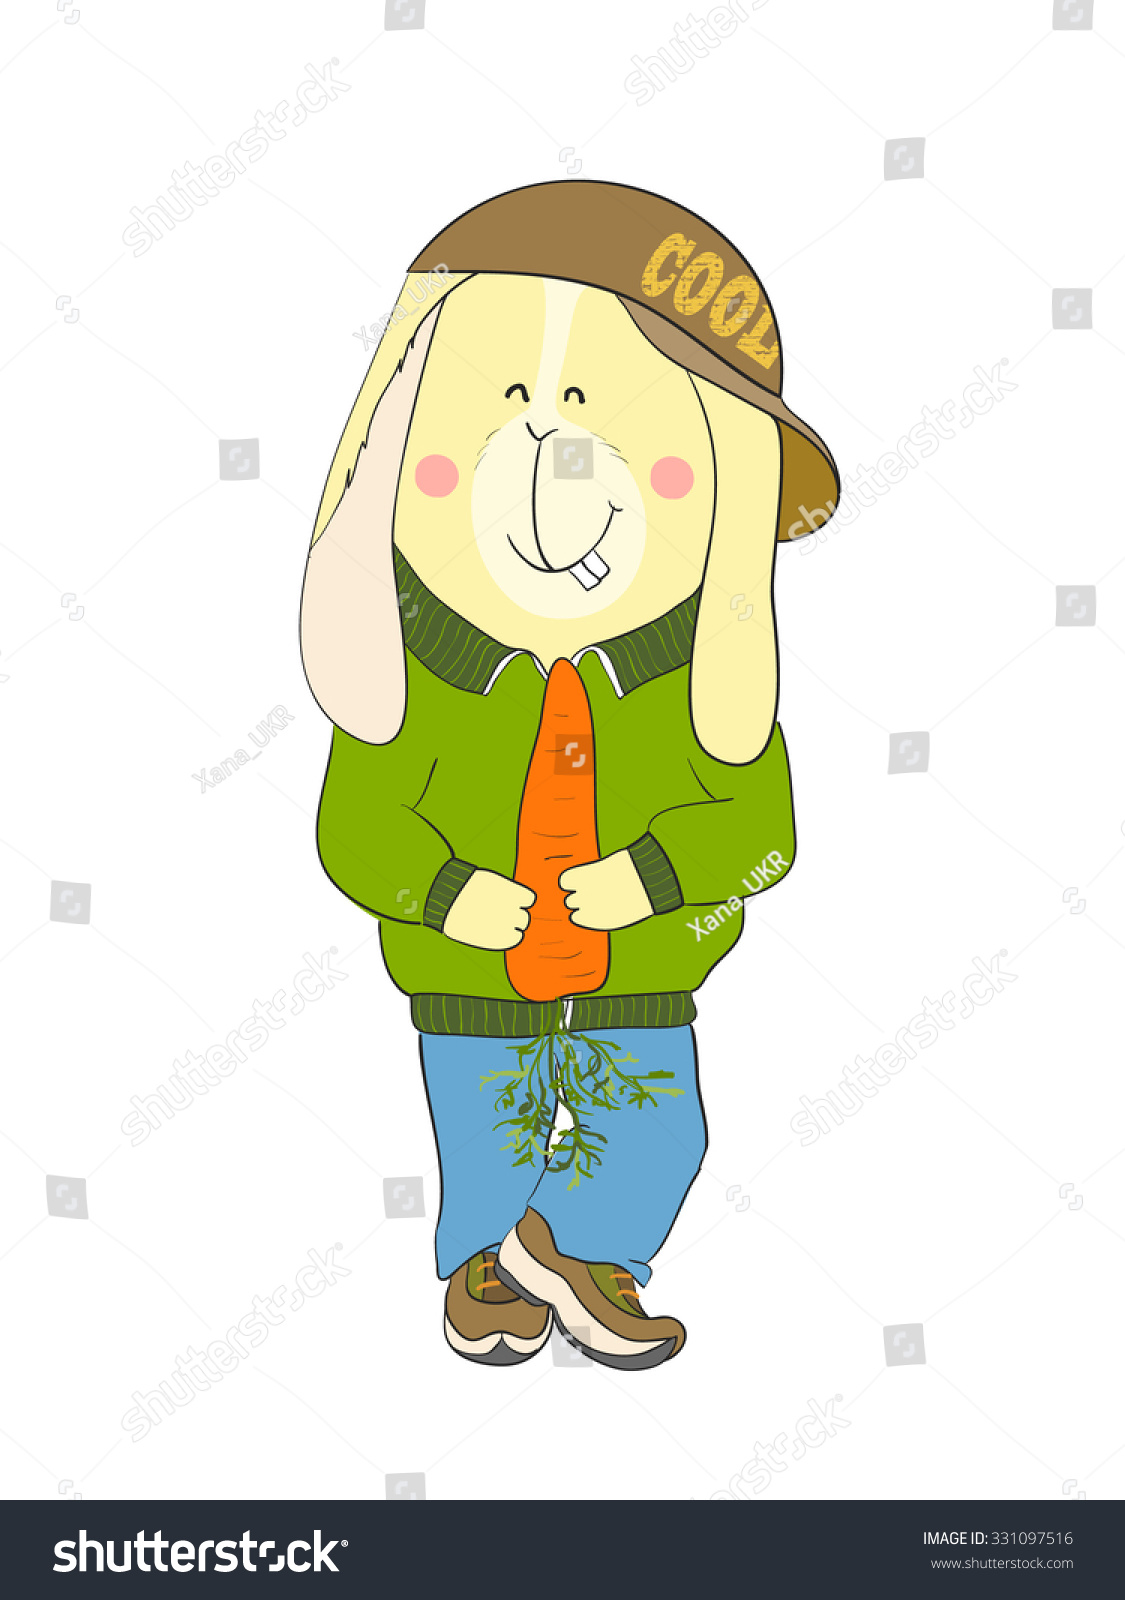 Cartoon Characters Phone Numbers : Cartoon character card notebook phone diary stock vector